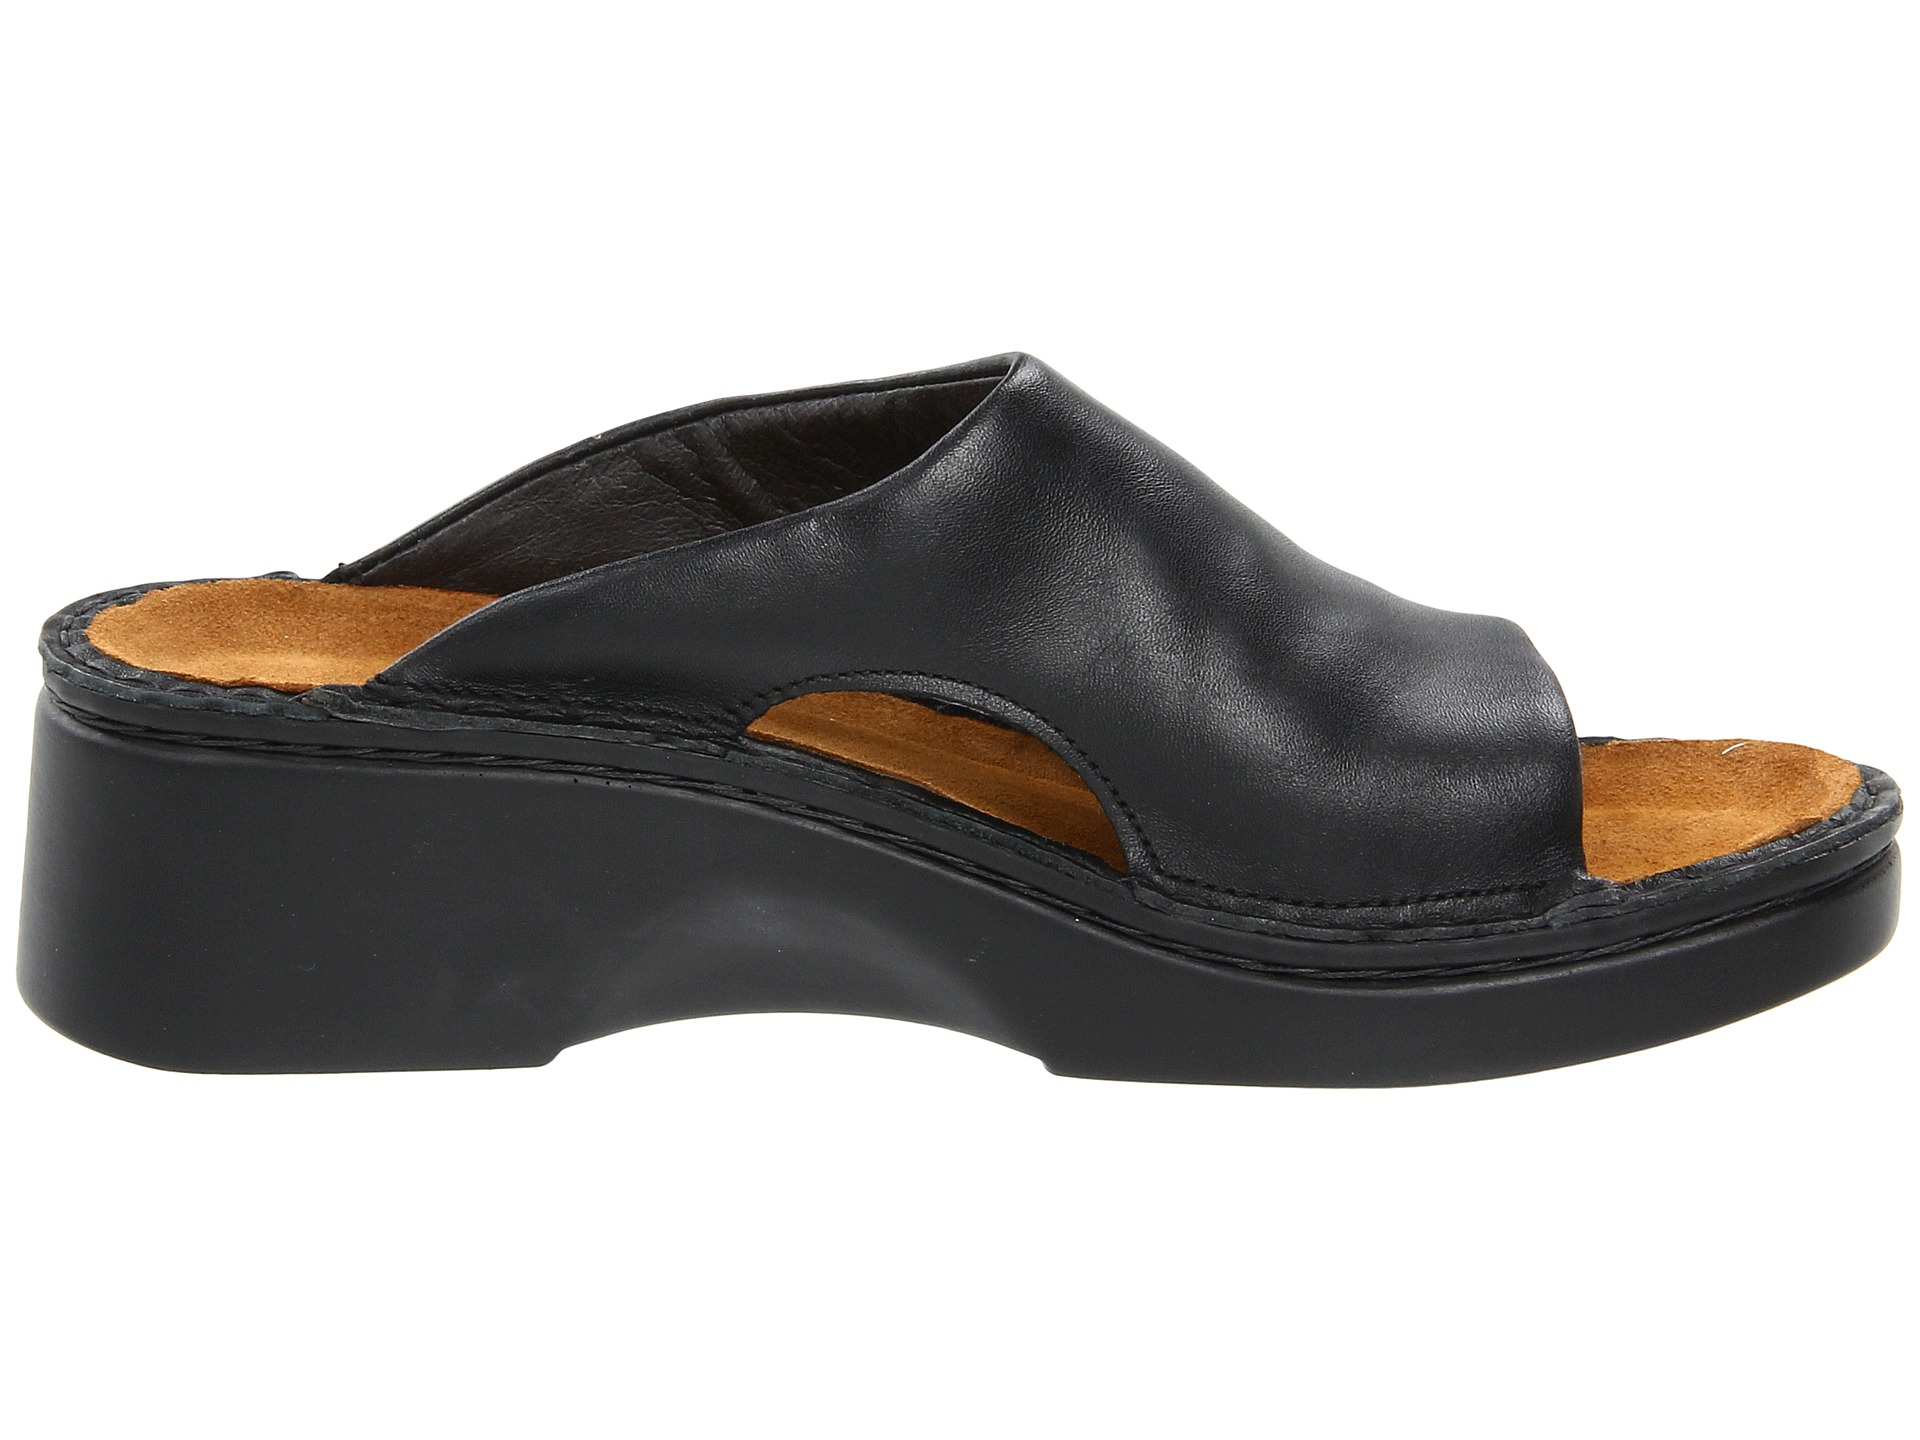 Zappos Naot Womens Shoes